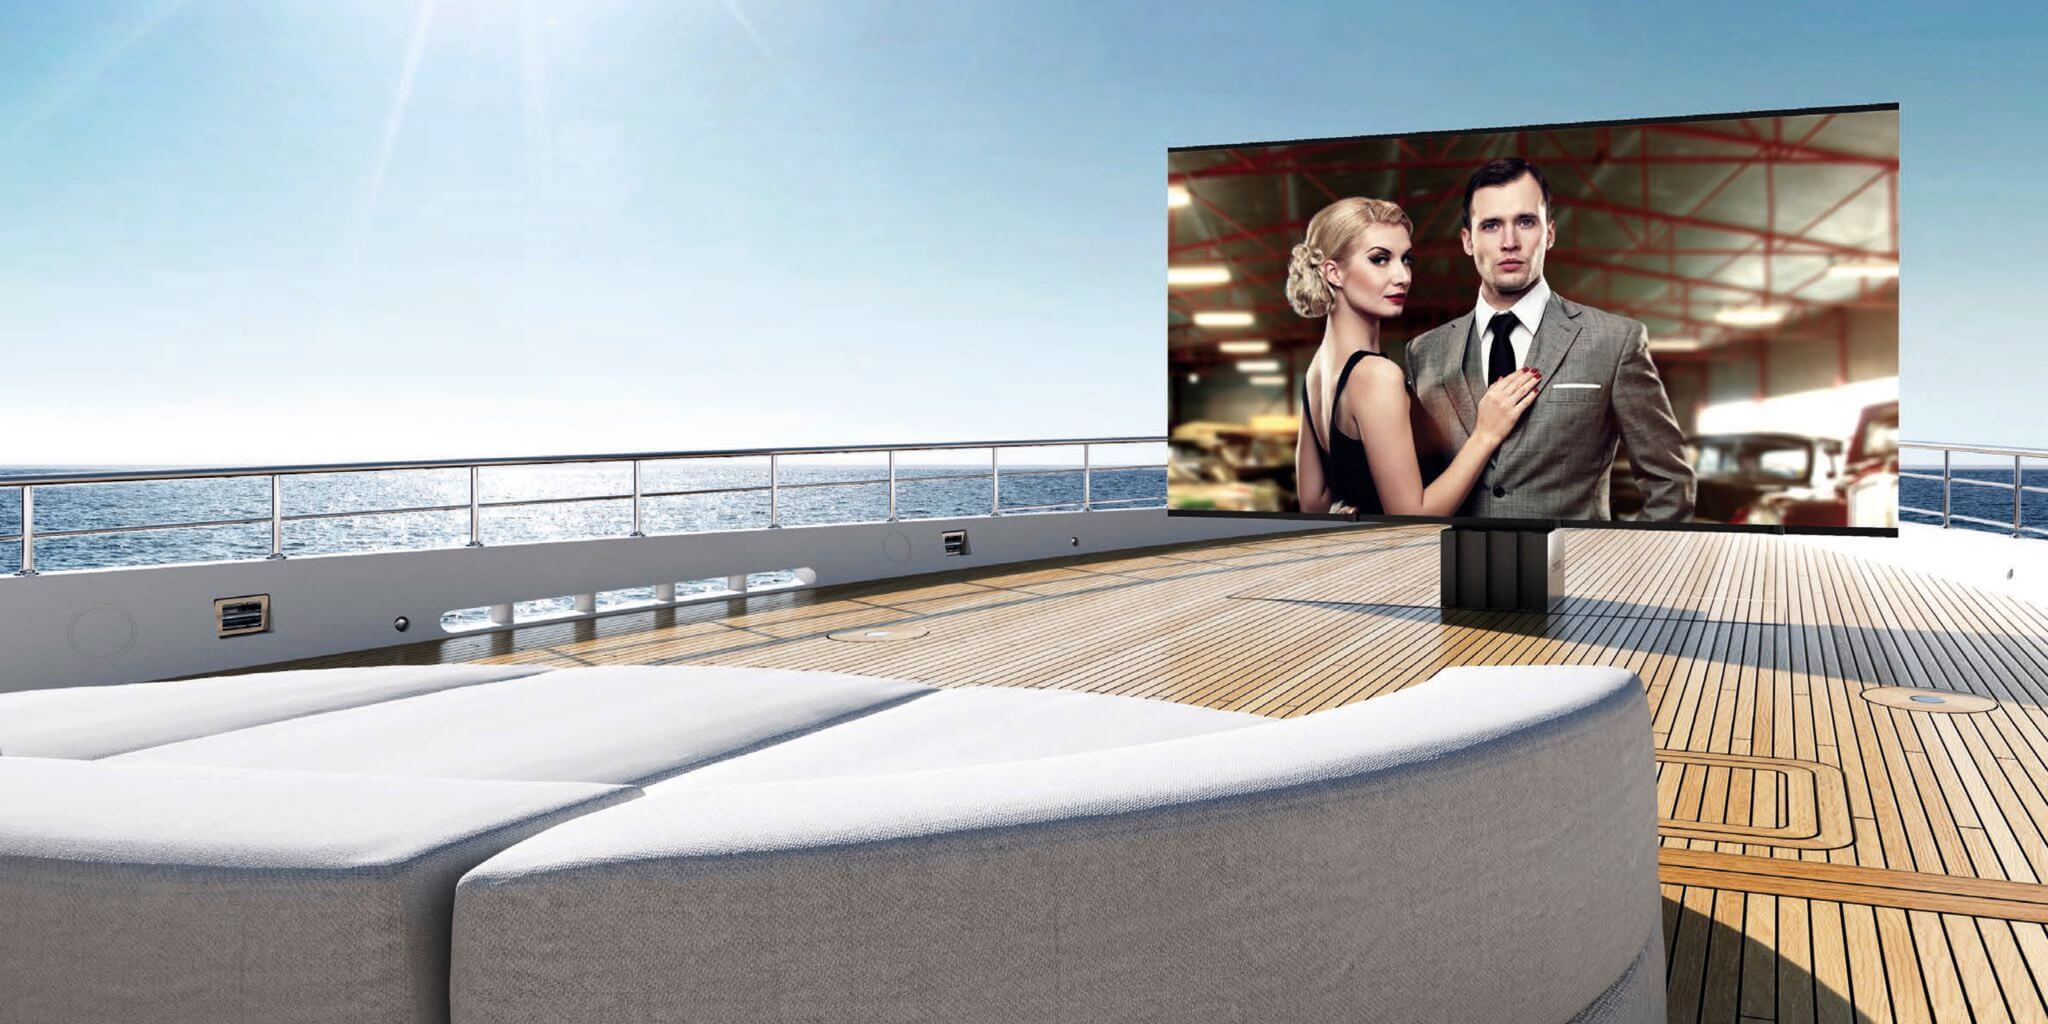 C SEED Supermarine TV Yacht Bow JPEG_2048x1024_60% tinified